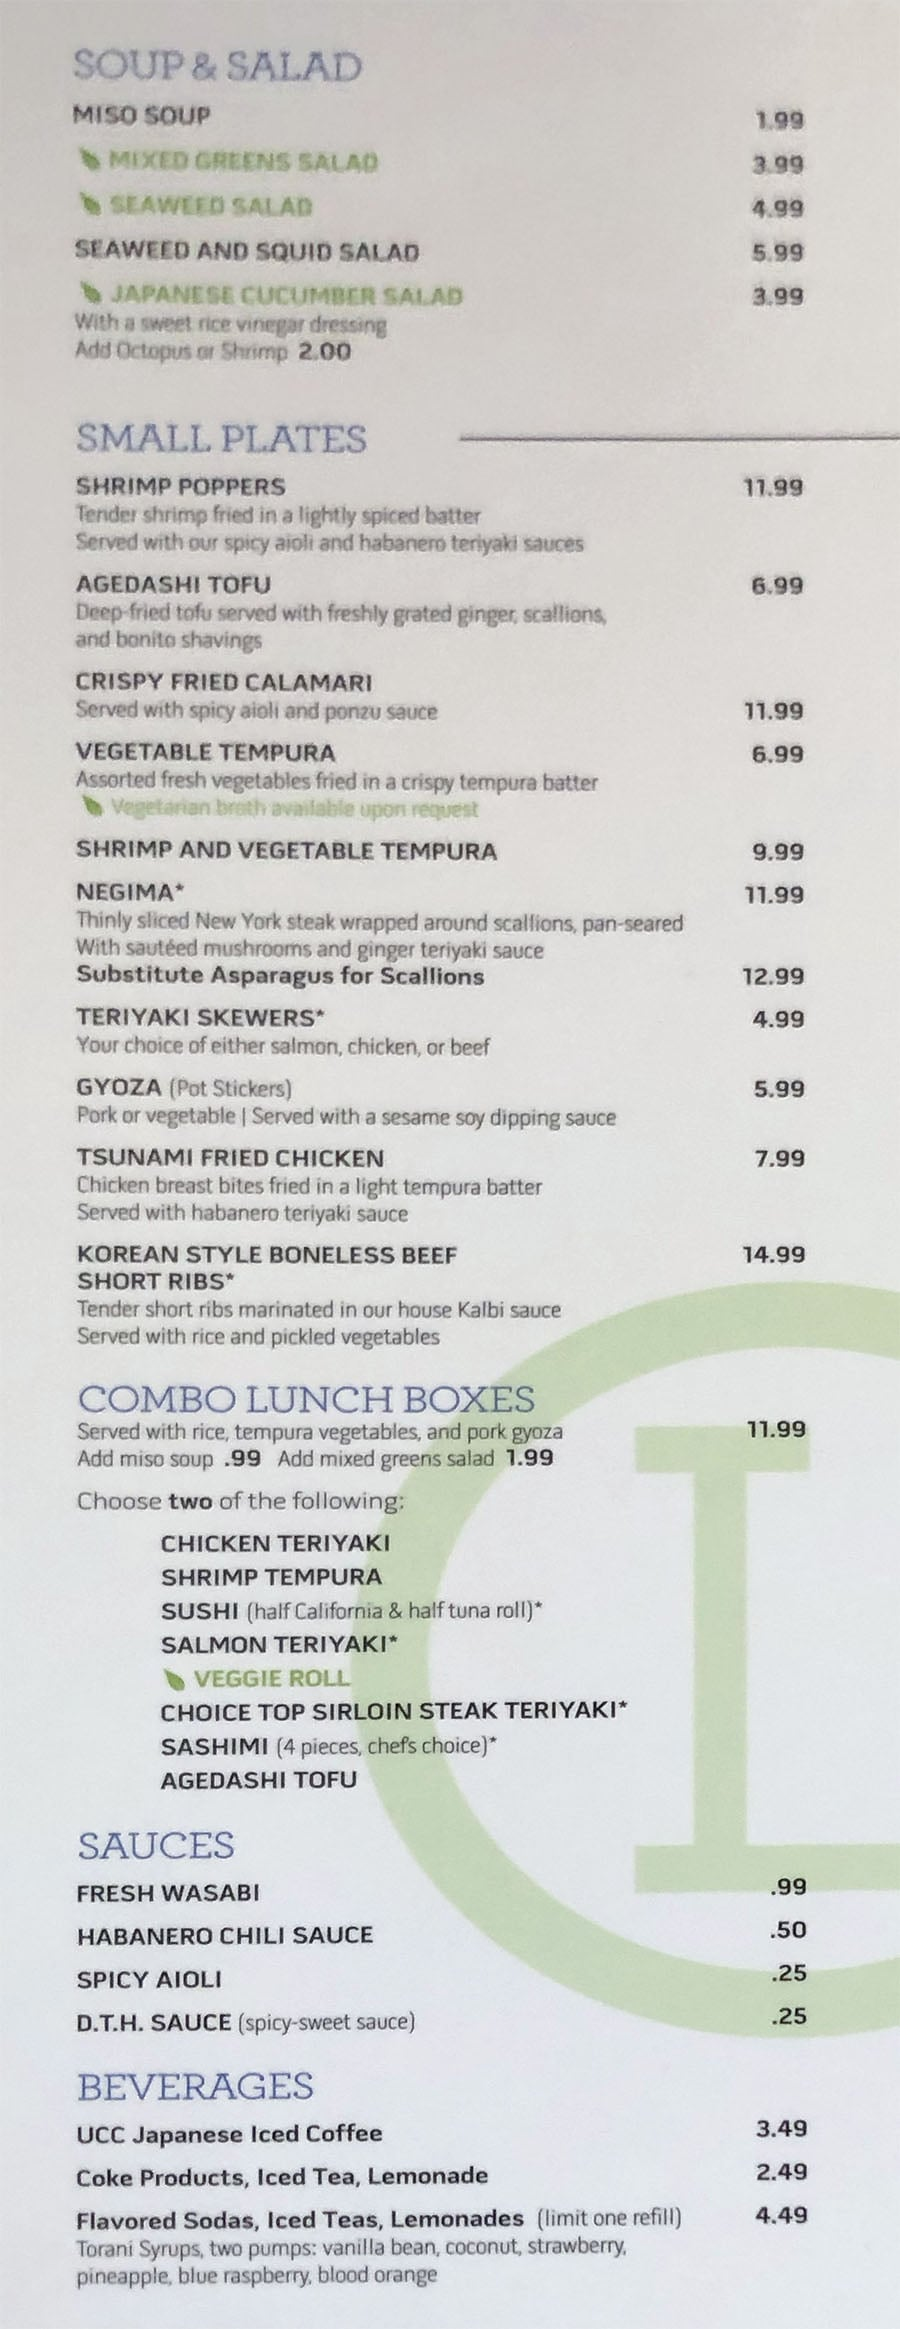 Tsunami menu - soup, salad, small plates, lunch bento boxes, sauces, beverages